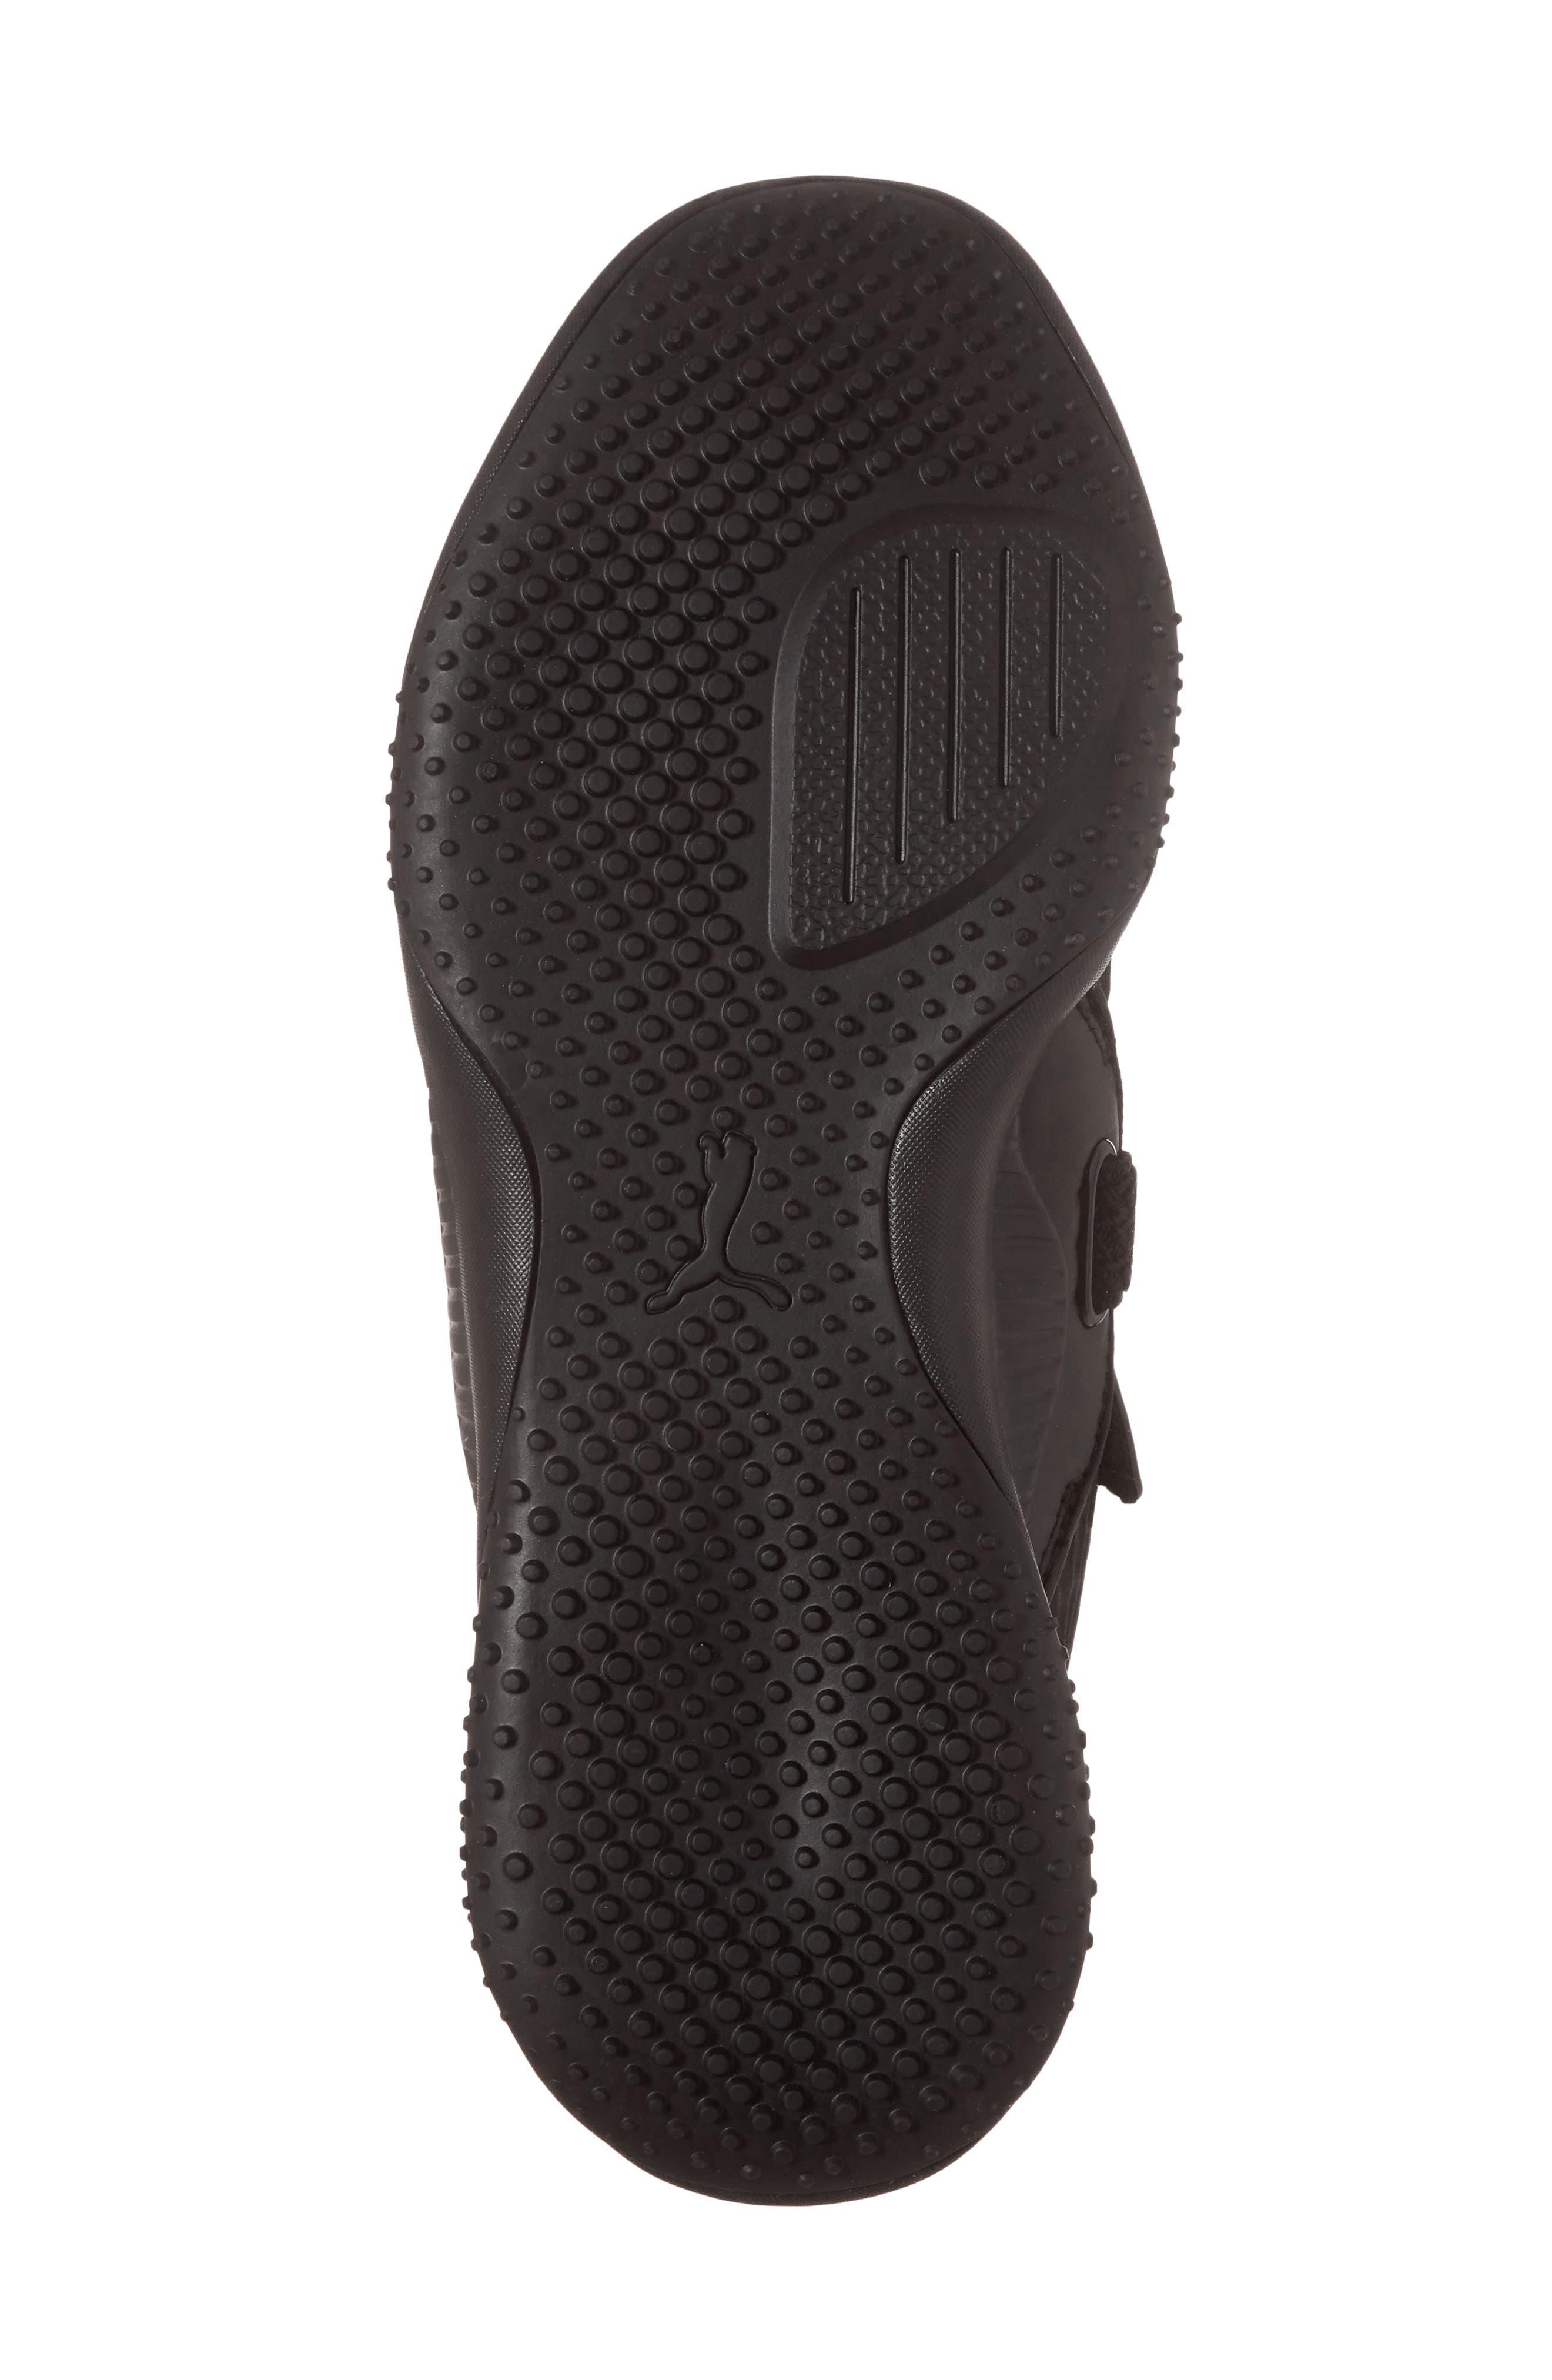 Mostro Fashion Sneaker,                             Alternate thumbnail 6, color,                             Puma Black/ Puma Black